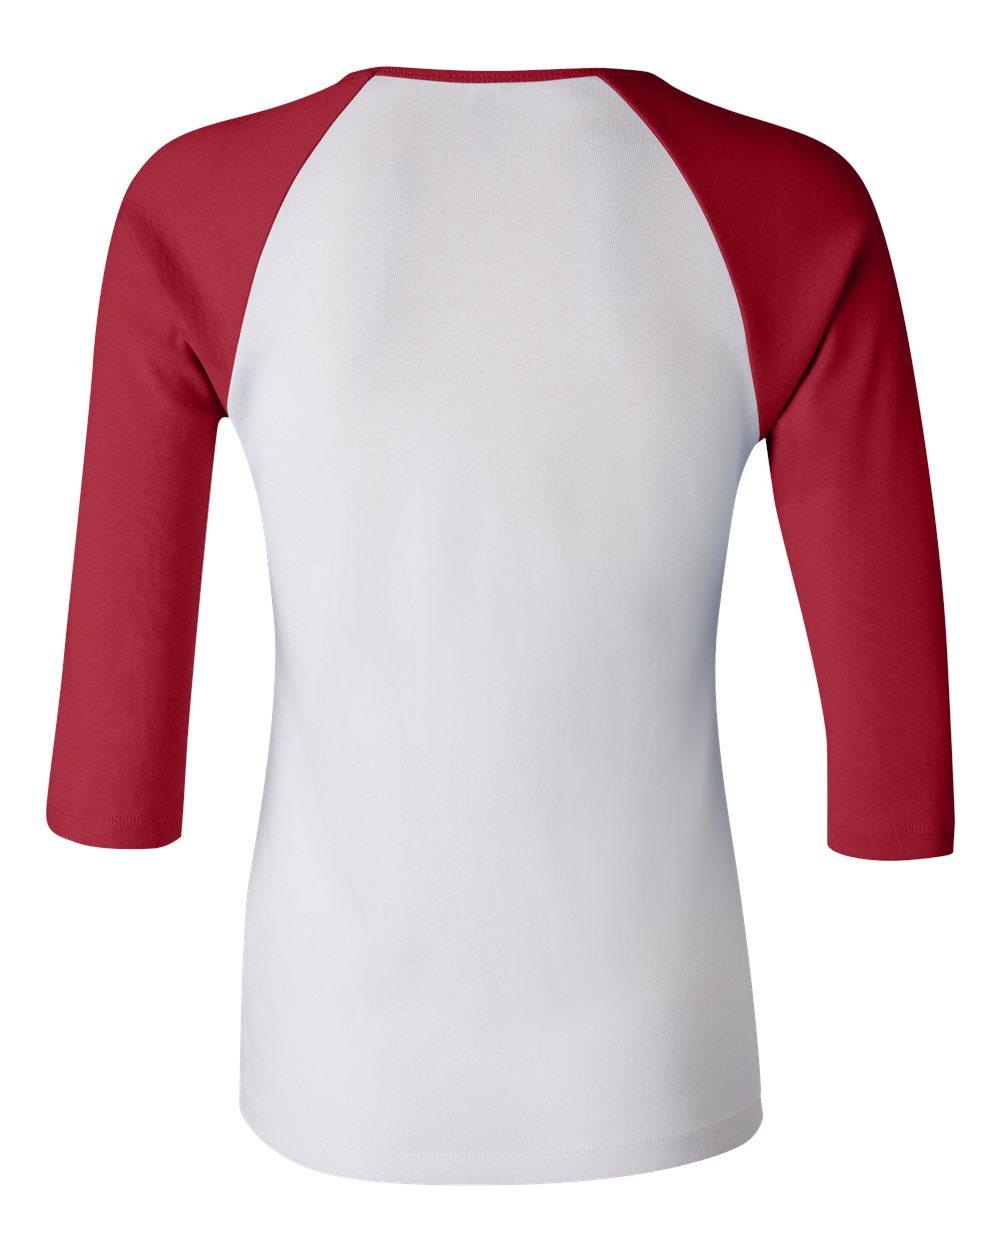 Bella-Canvas-Womens-Stretch-Rib-3-4-Sleeve-Contrast-Raglan-T-Shirt-B2000 thumbnail 26